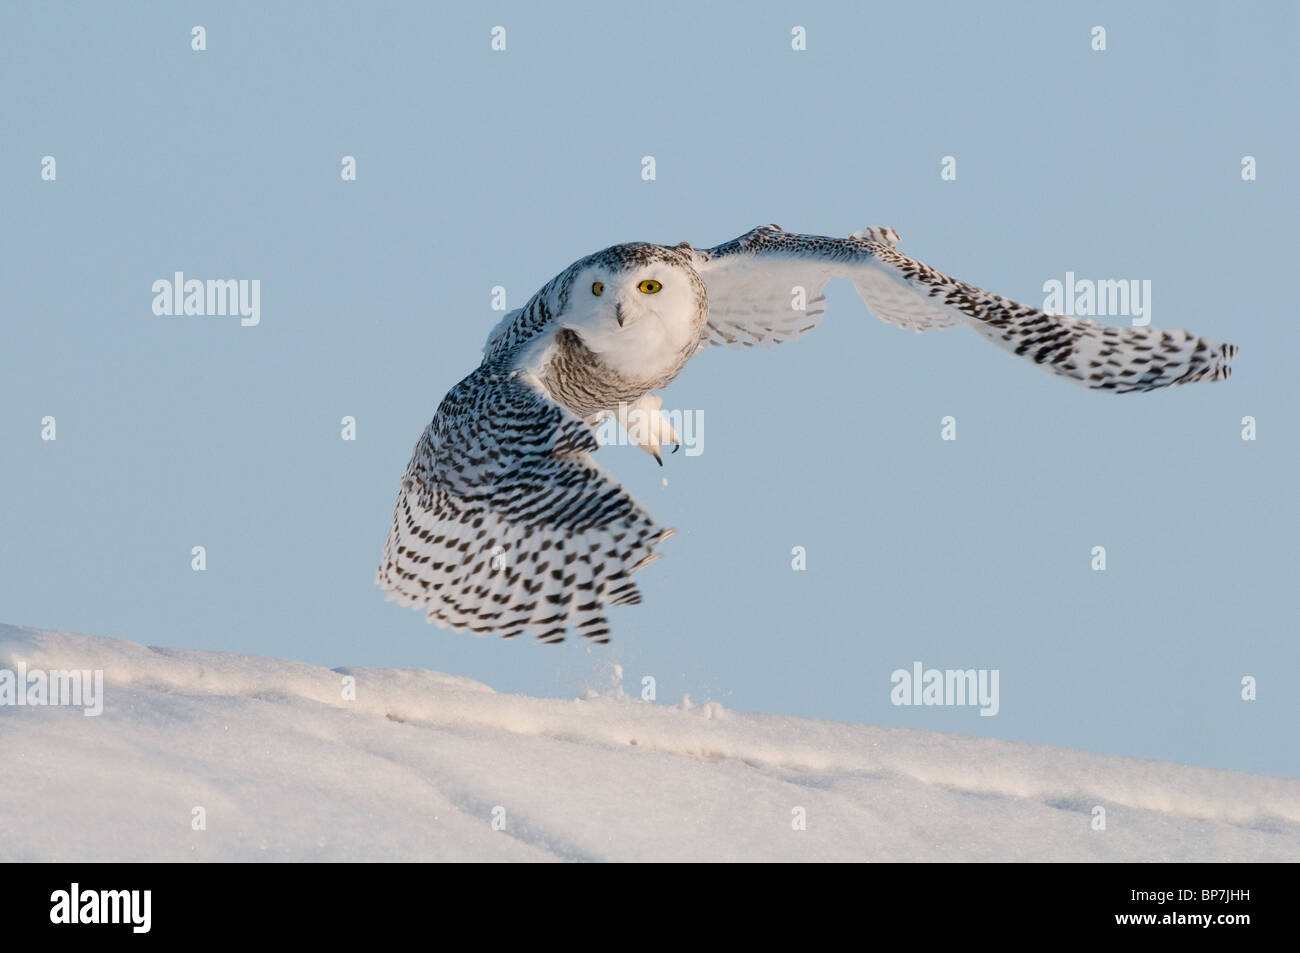 Snowy Owl (Bubo scandiacus, Nyctea scandiaca) in flight above snow. Stock Photo